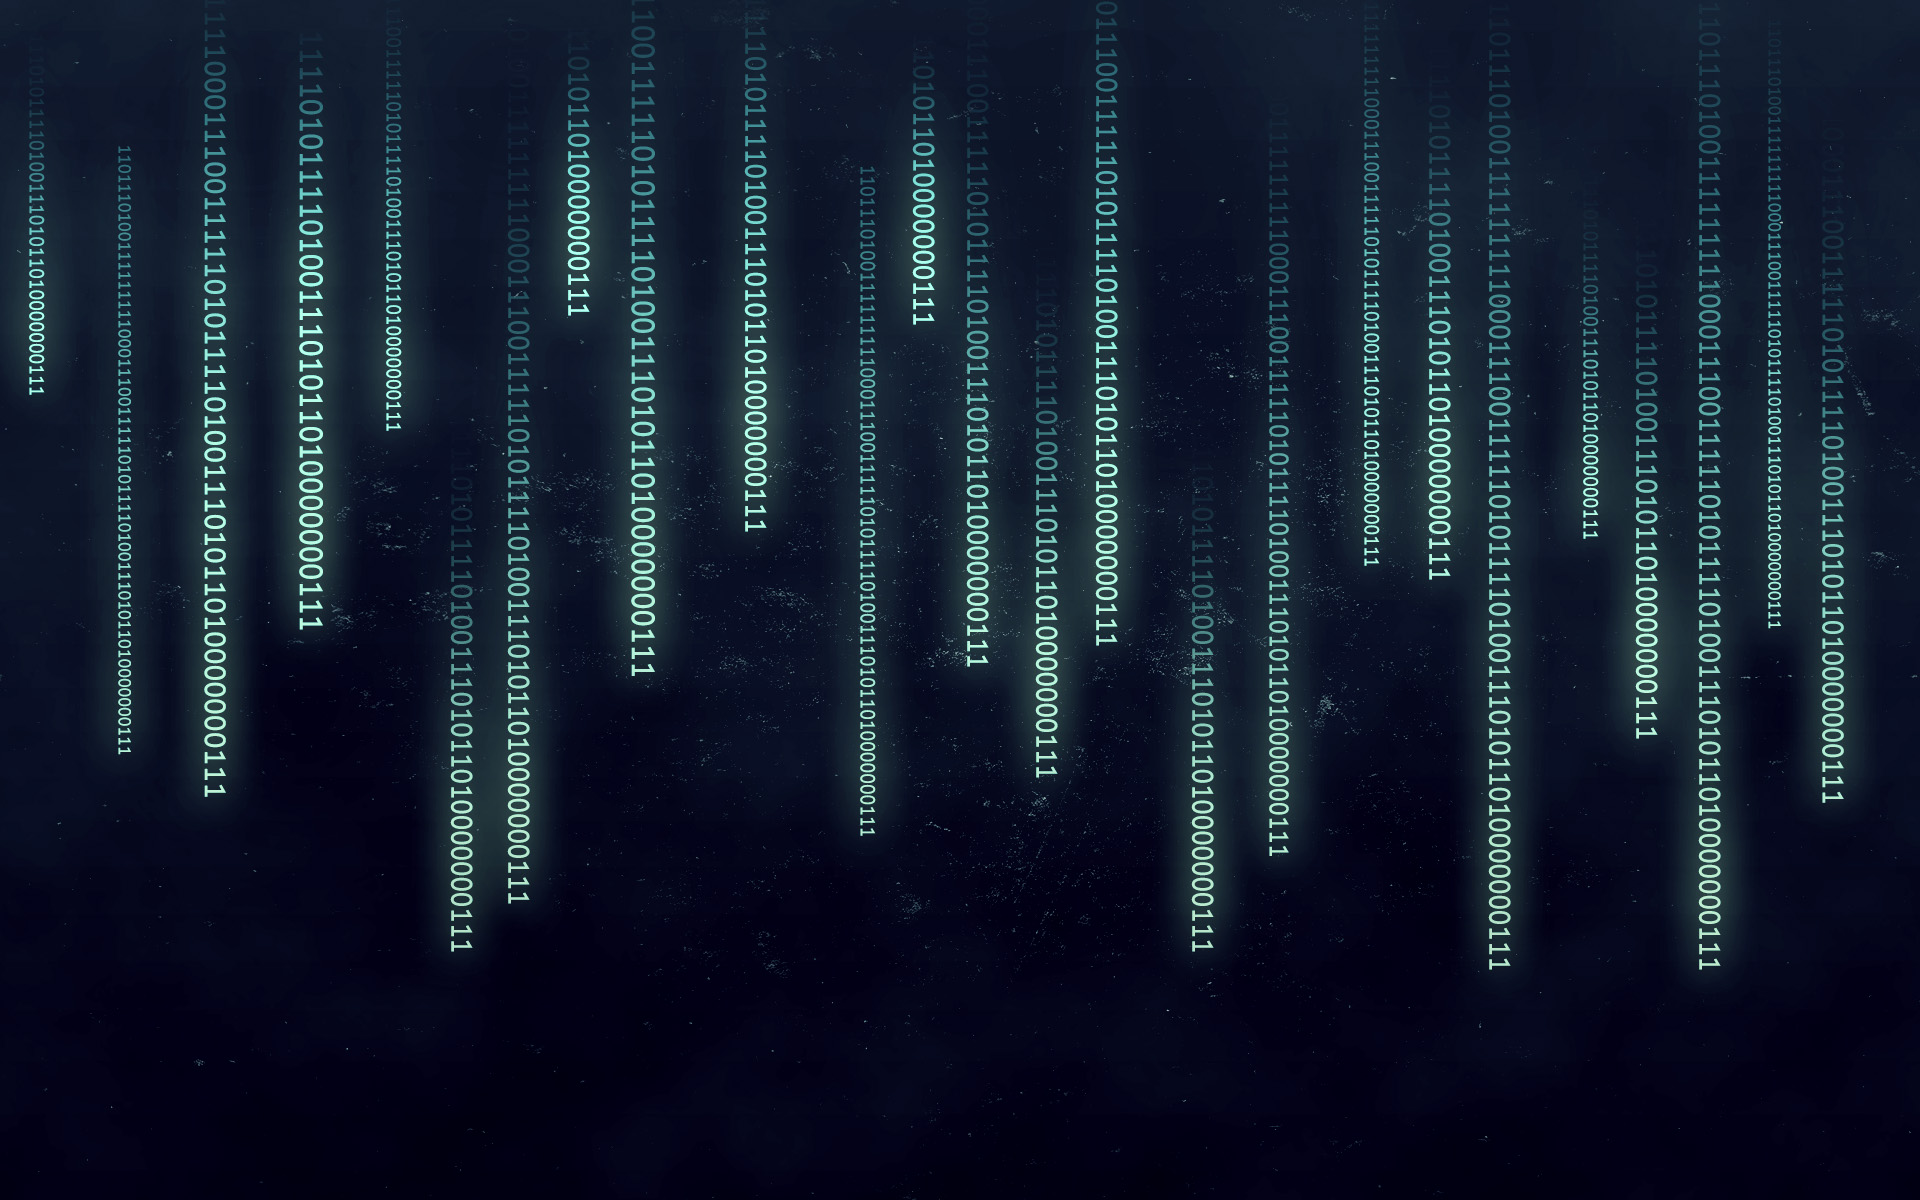 37 Programmer Code Wallpaper Backgrounds Download 1920x1200